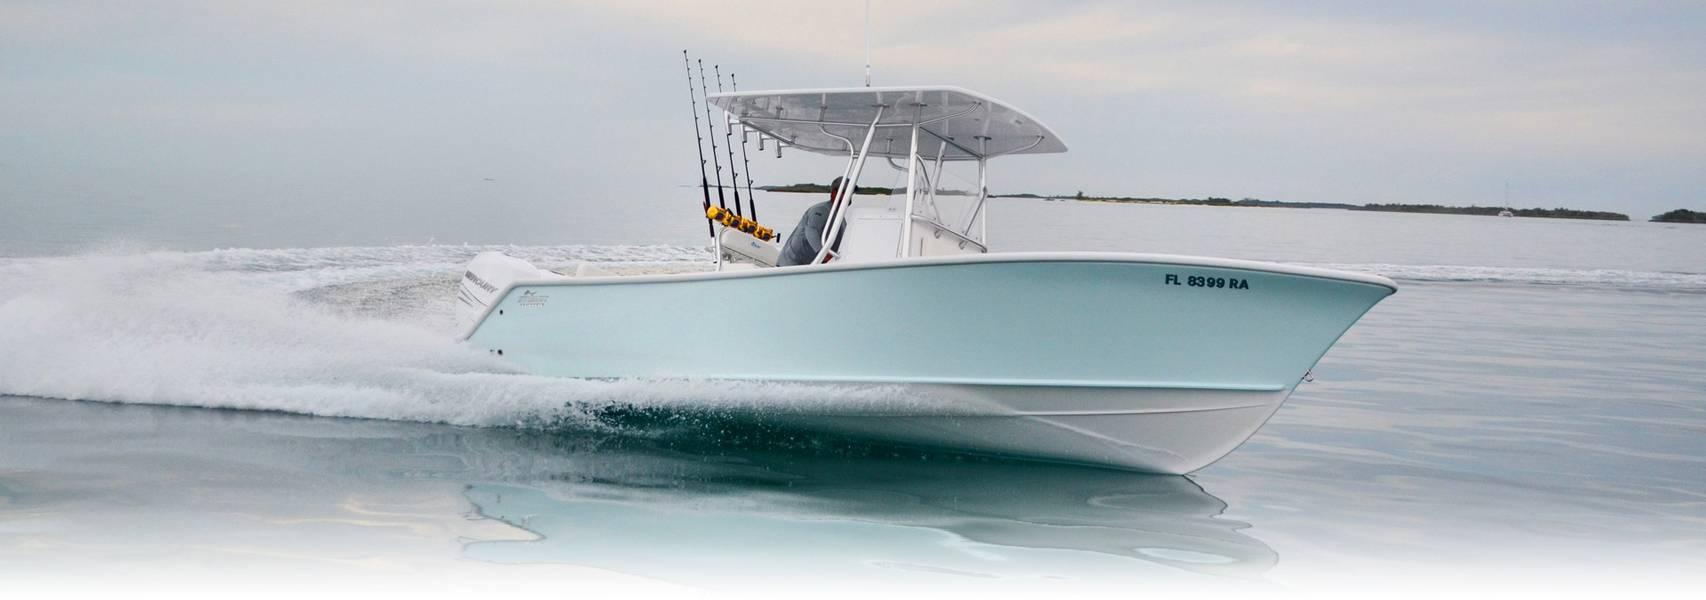 Stuart Boatworks 27是Ocean5的游戏改造者,今年首次在迈阿密国际游艇展上展出。图片由Ocean 5 Naval Architects提供。